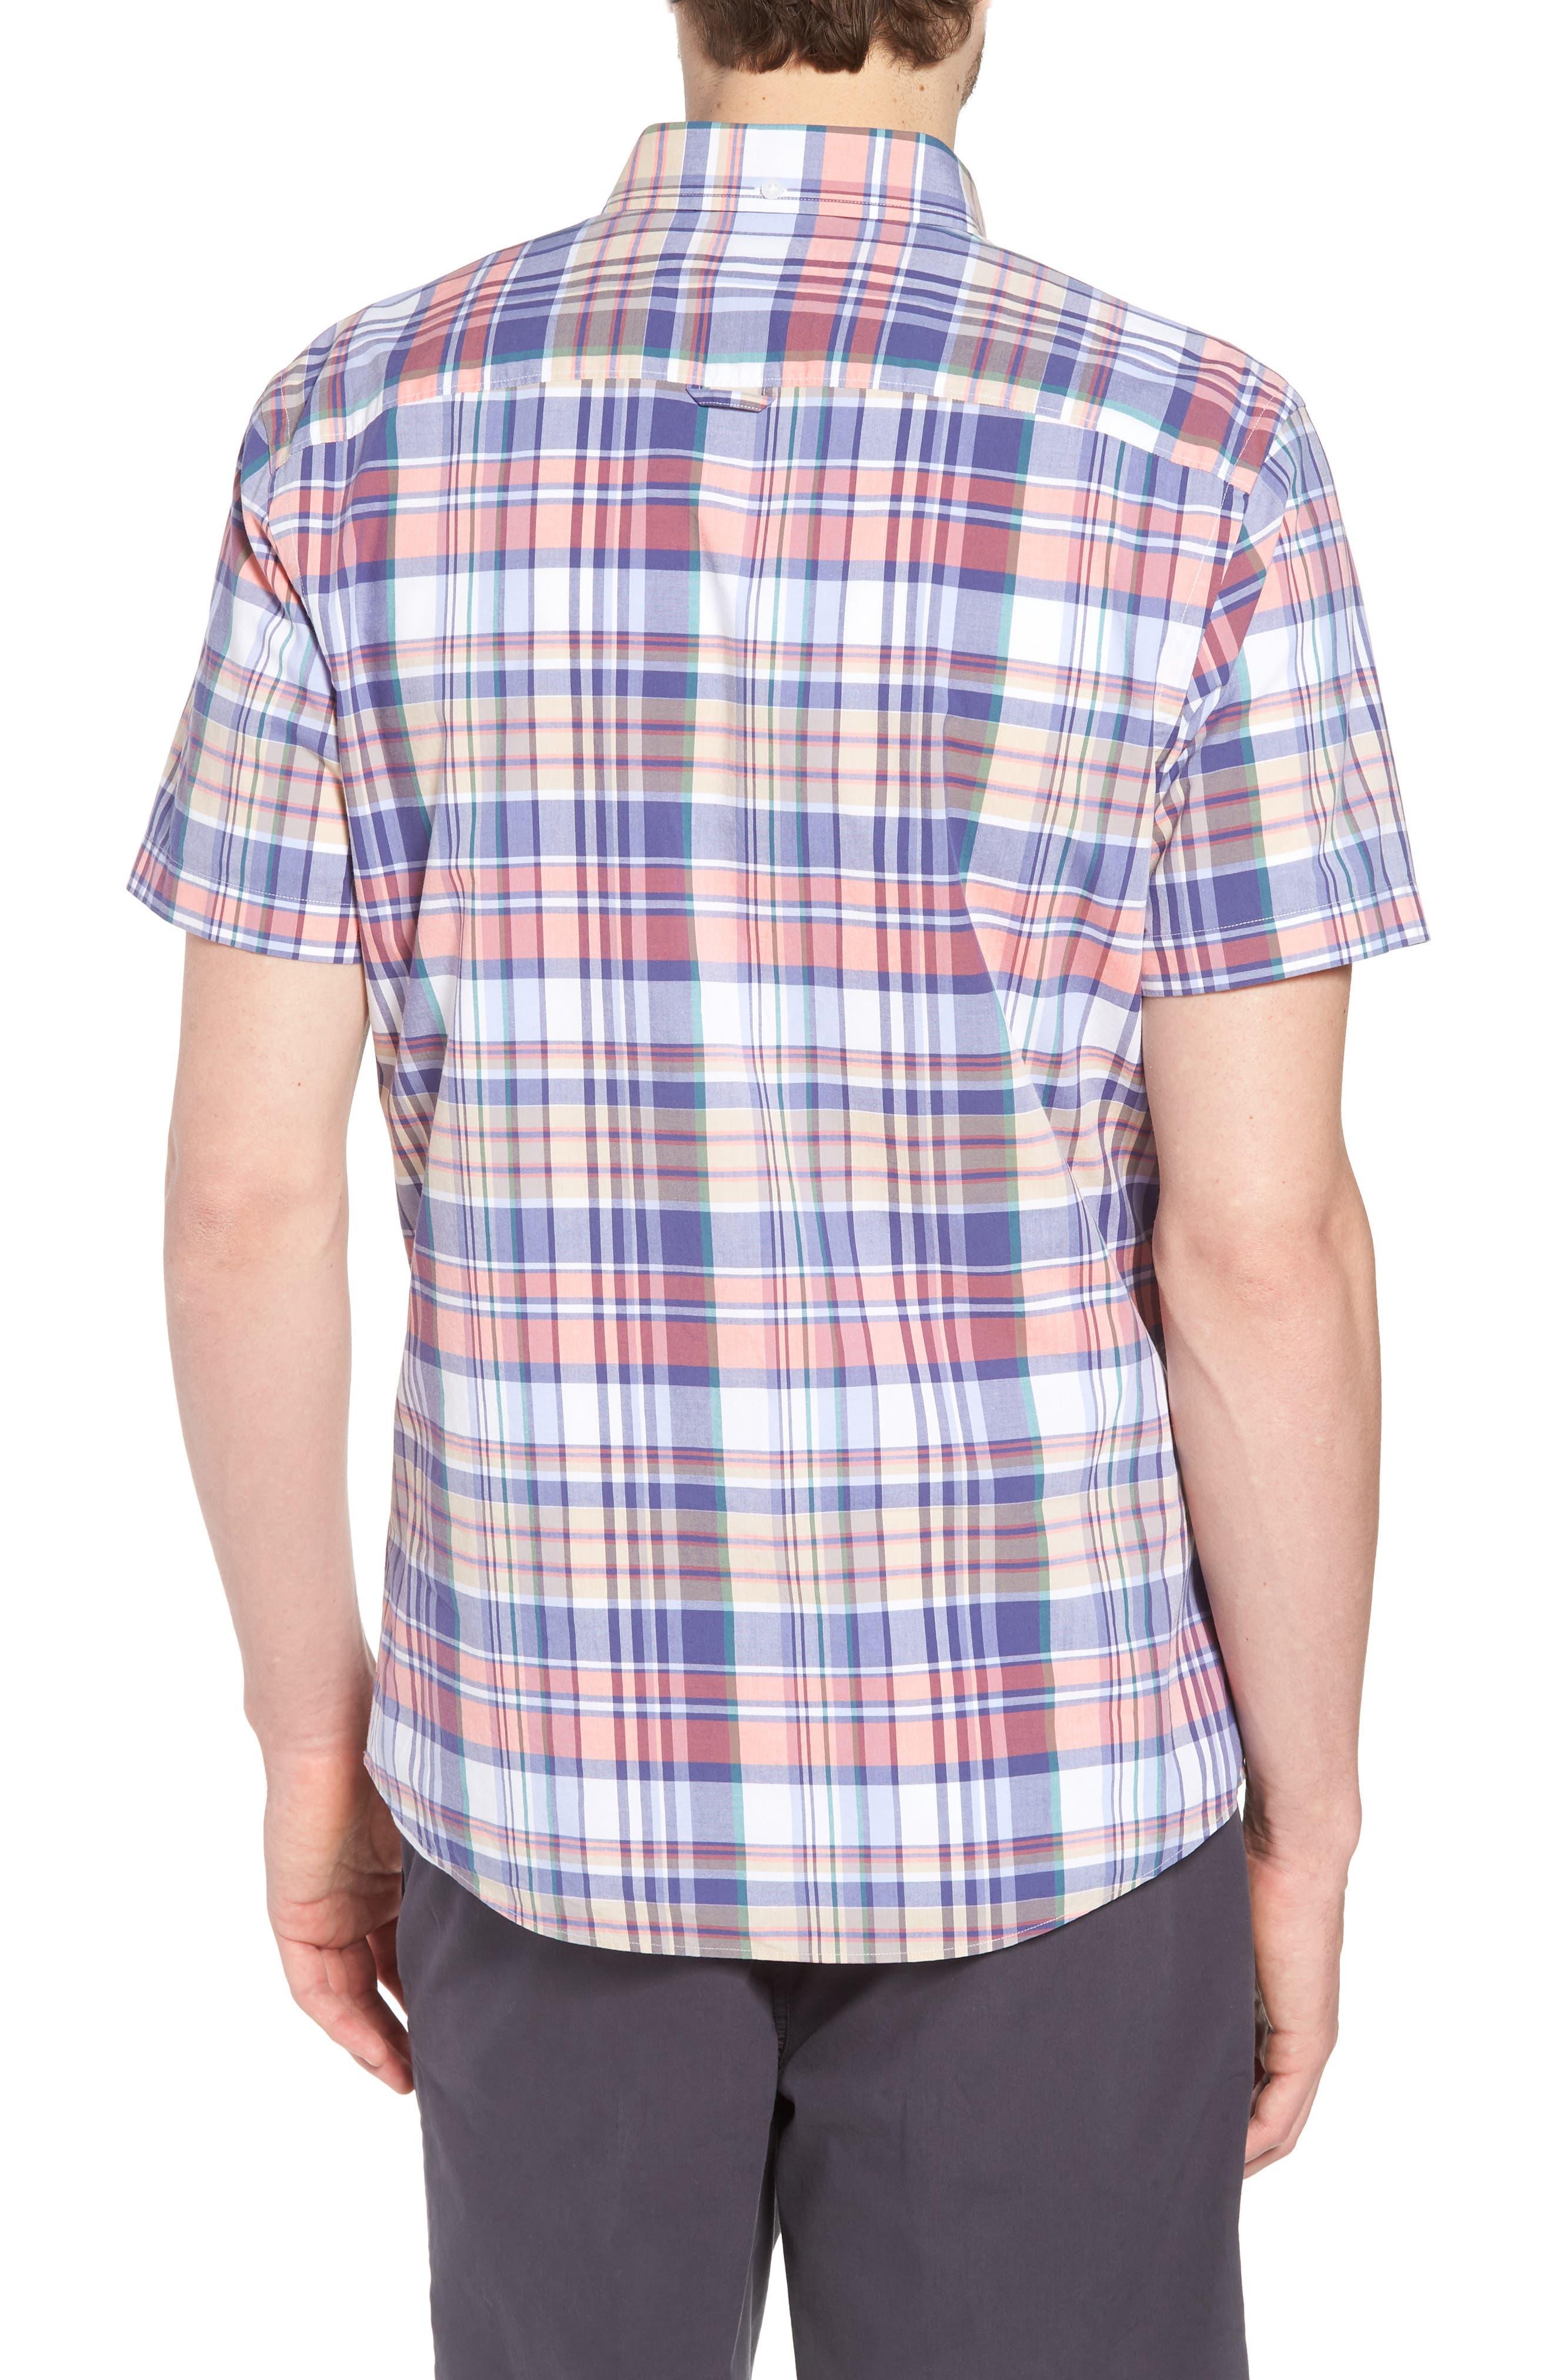 Trim Fit Plaid Short Sleeve Sport Shirt,                             Alternate thumbnail 2, color,                             Navy Coral Multi Plaid